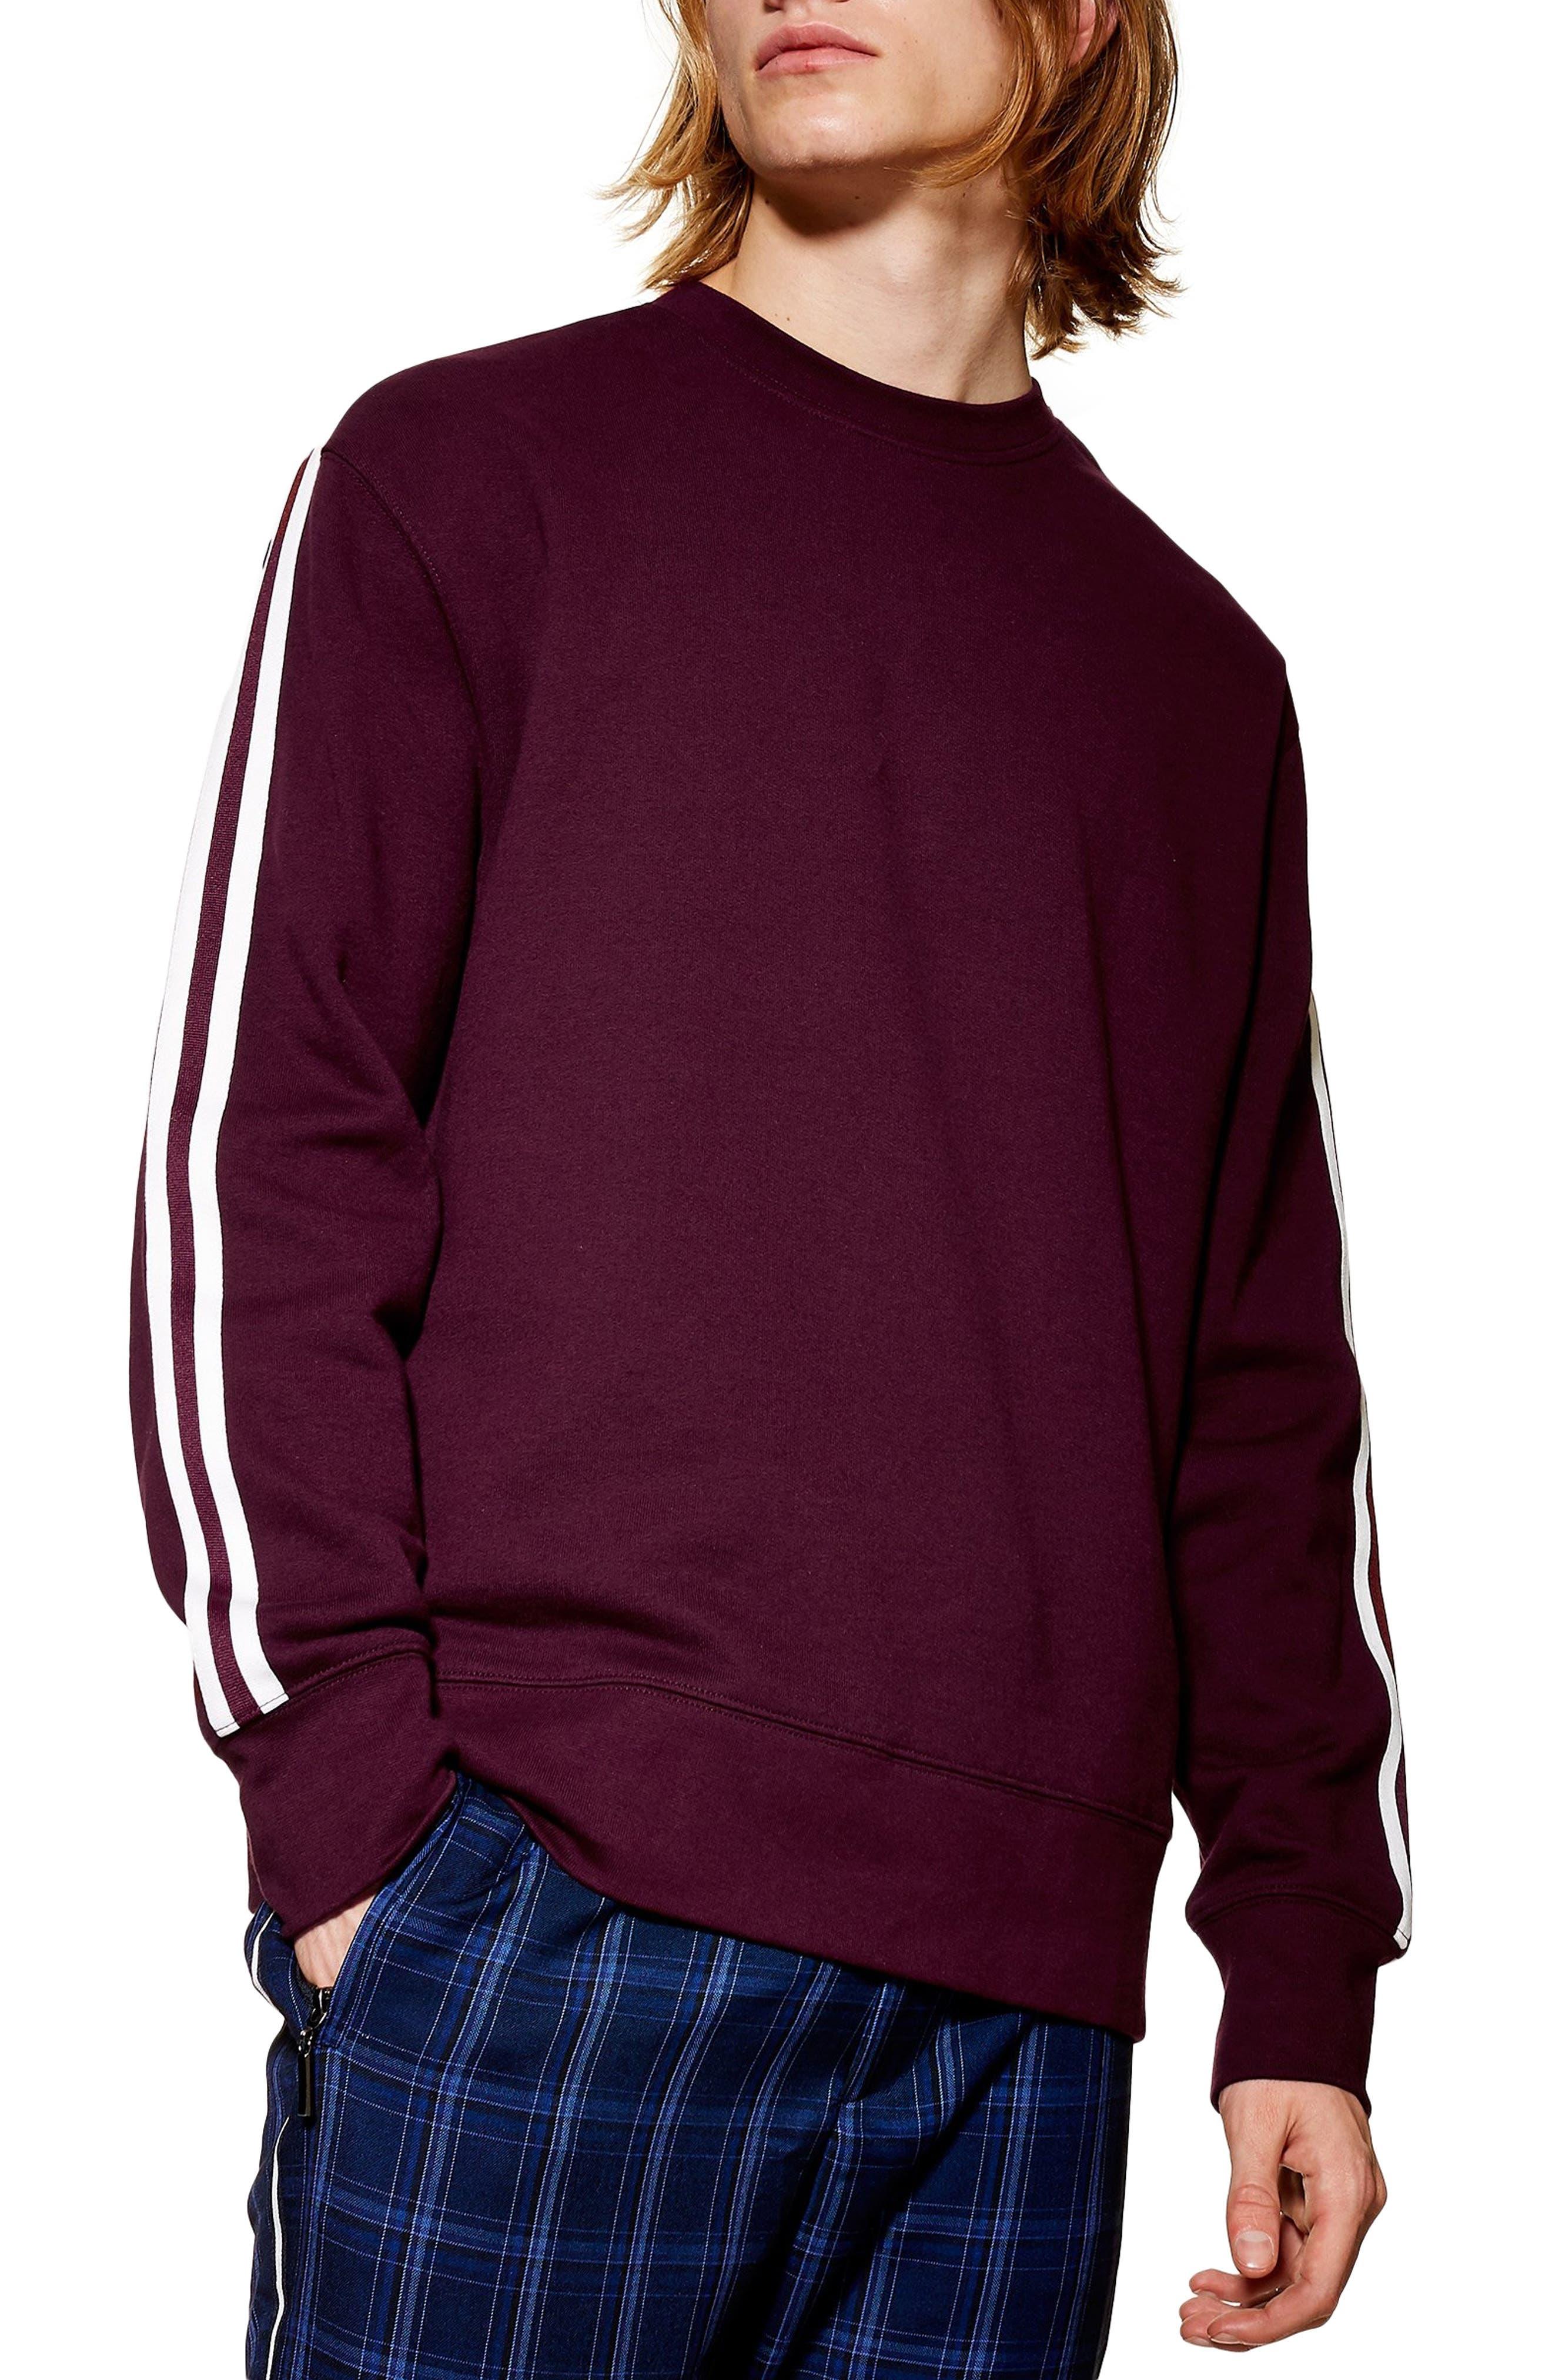 Topman Tape Crewneck Sweatshirt, Burgundy